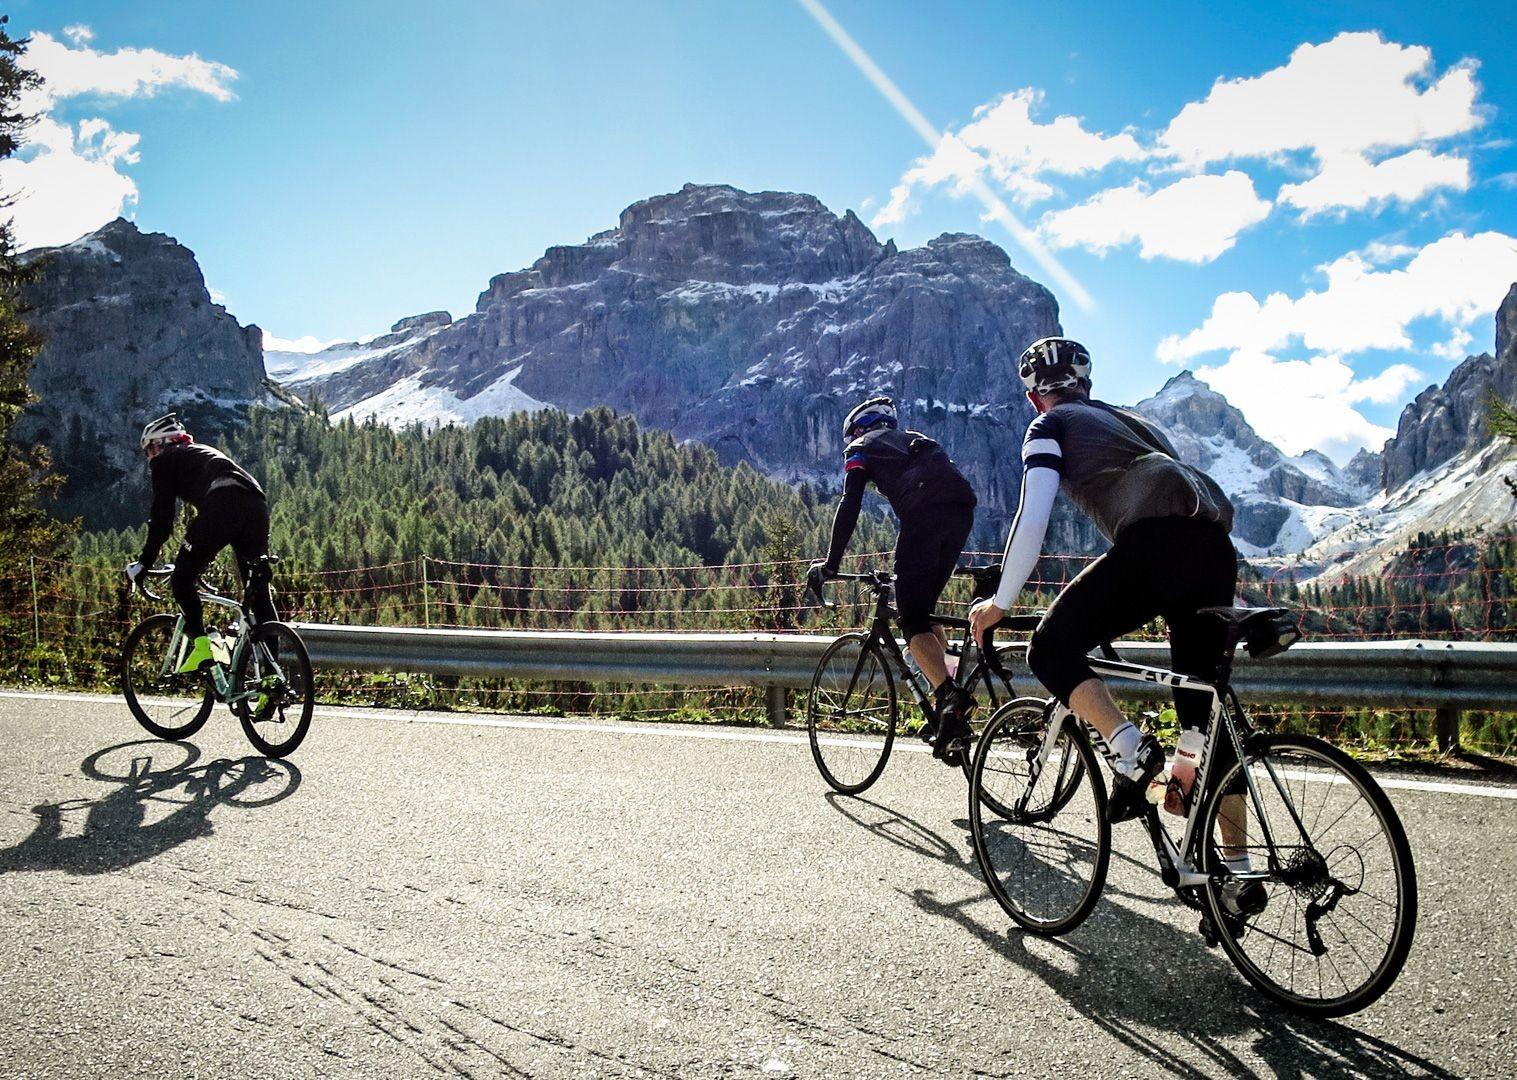 challenging-climbs-italian-dolomites-road-bike-skedaddle.jpg - Italy - Raid Dolomiti - Guided Road Cycling Holiday - Italia Road Cycling